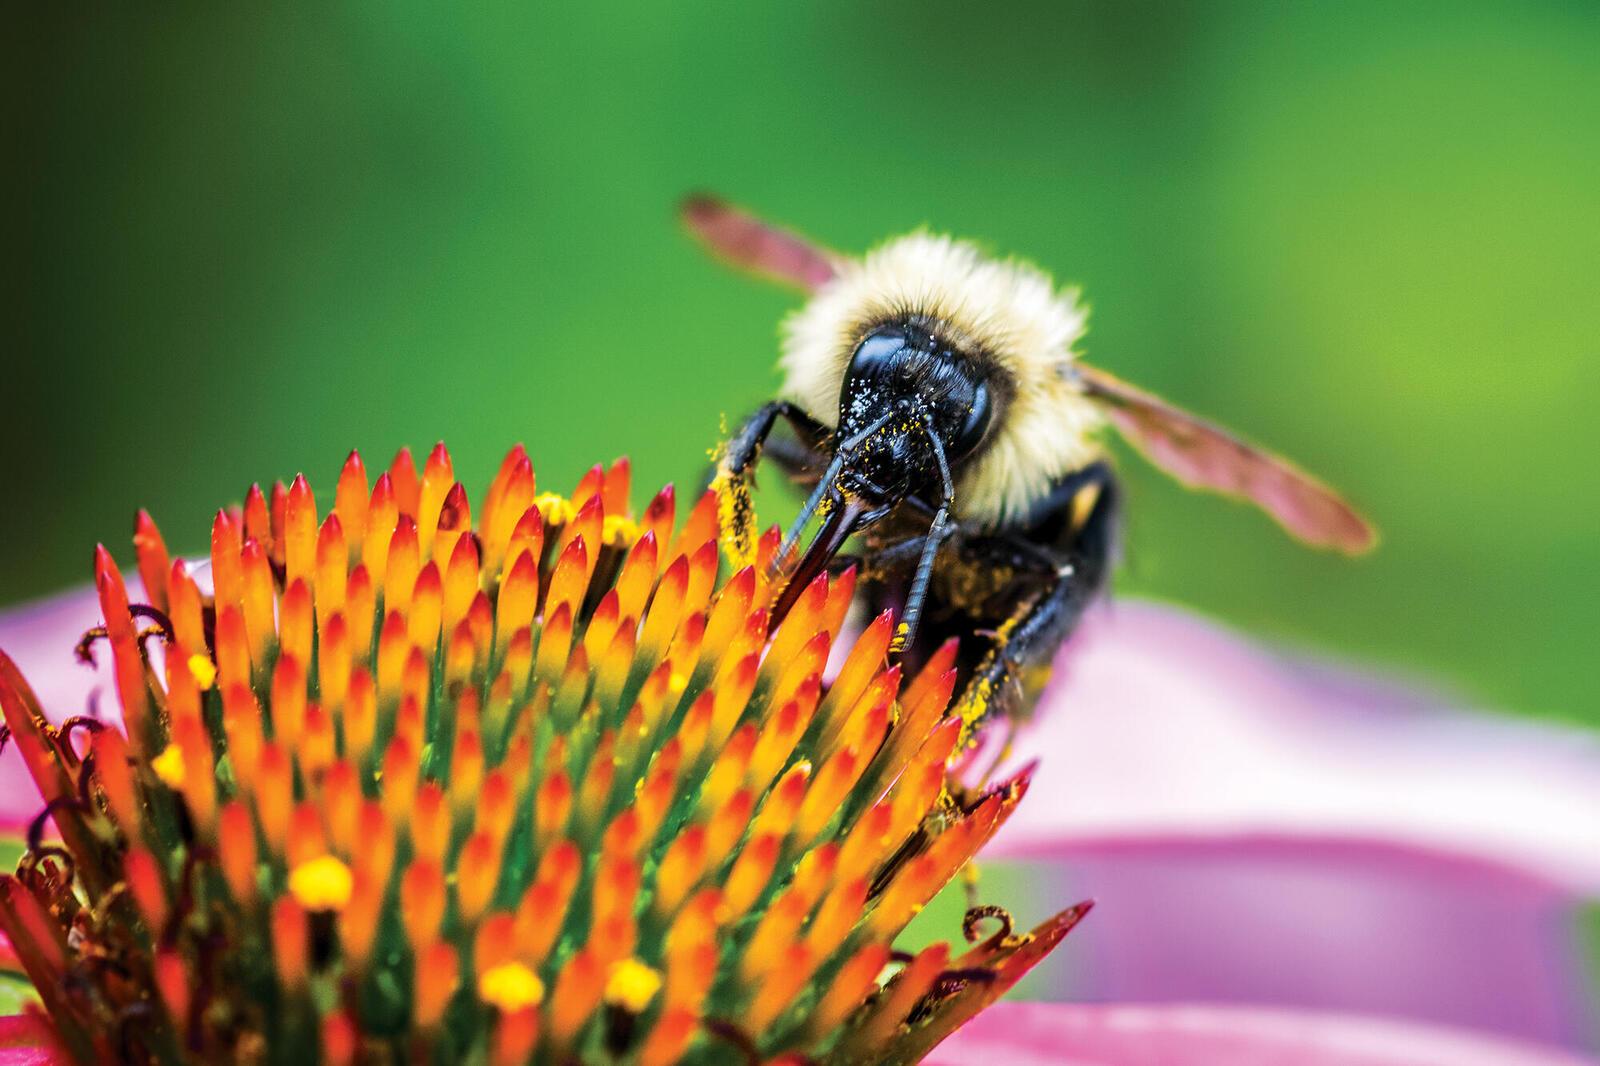 Closeup of bee on flower